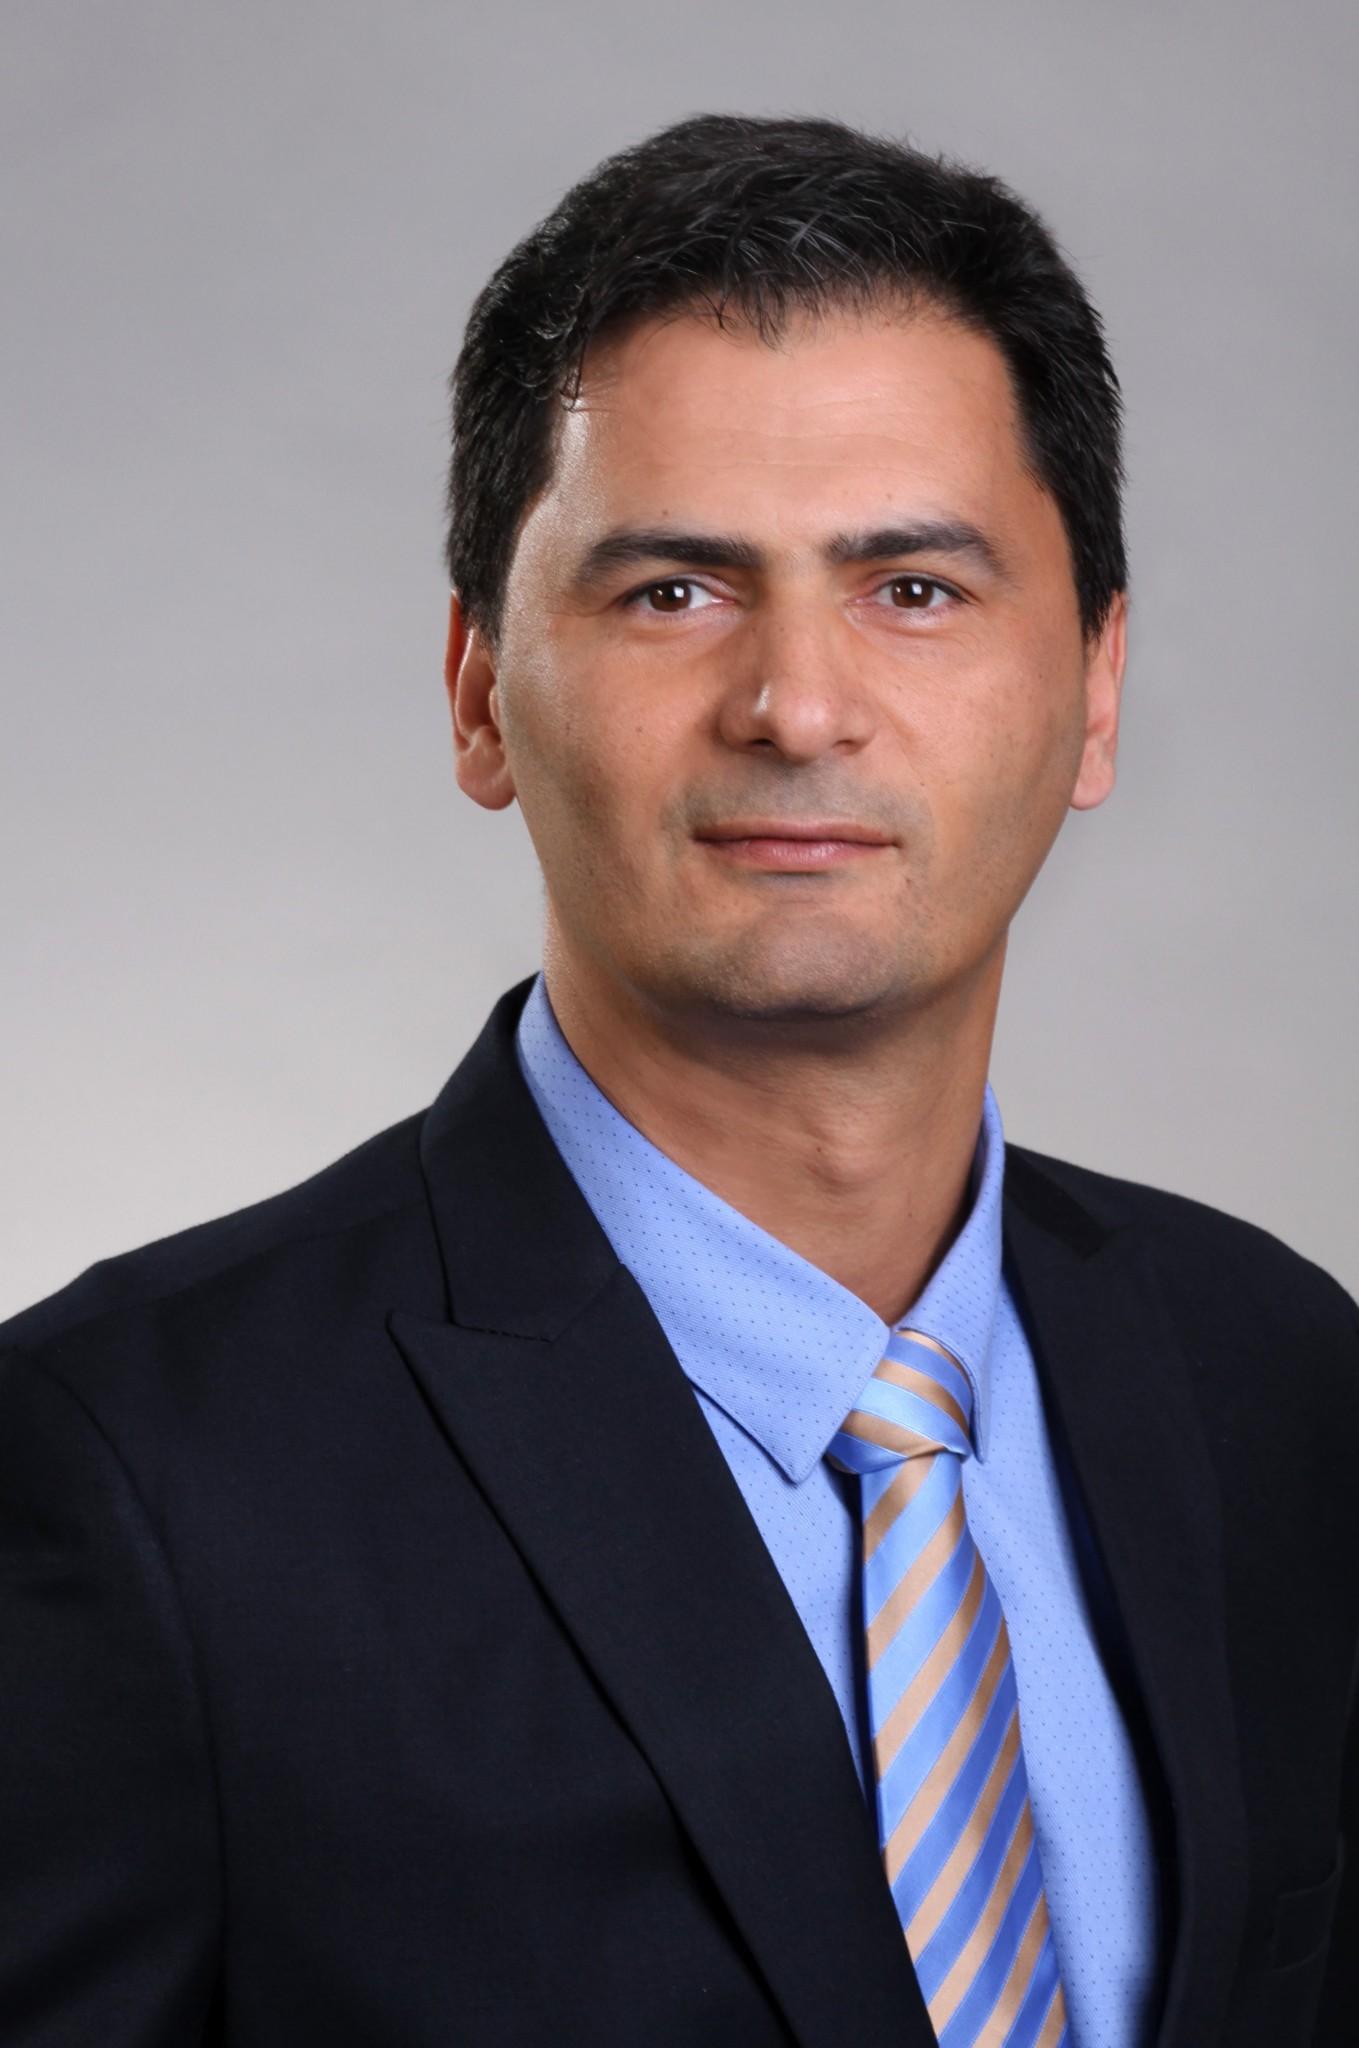 Yaron Saban, CEO of CreditPlace. Photo credit: Osnat Krasnansky